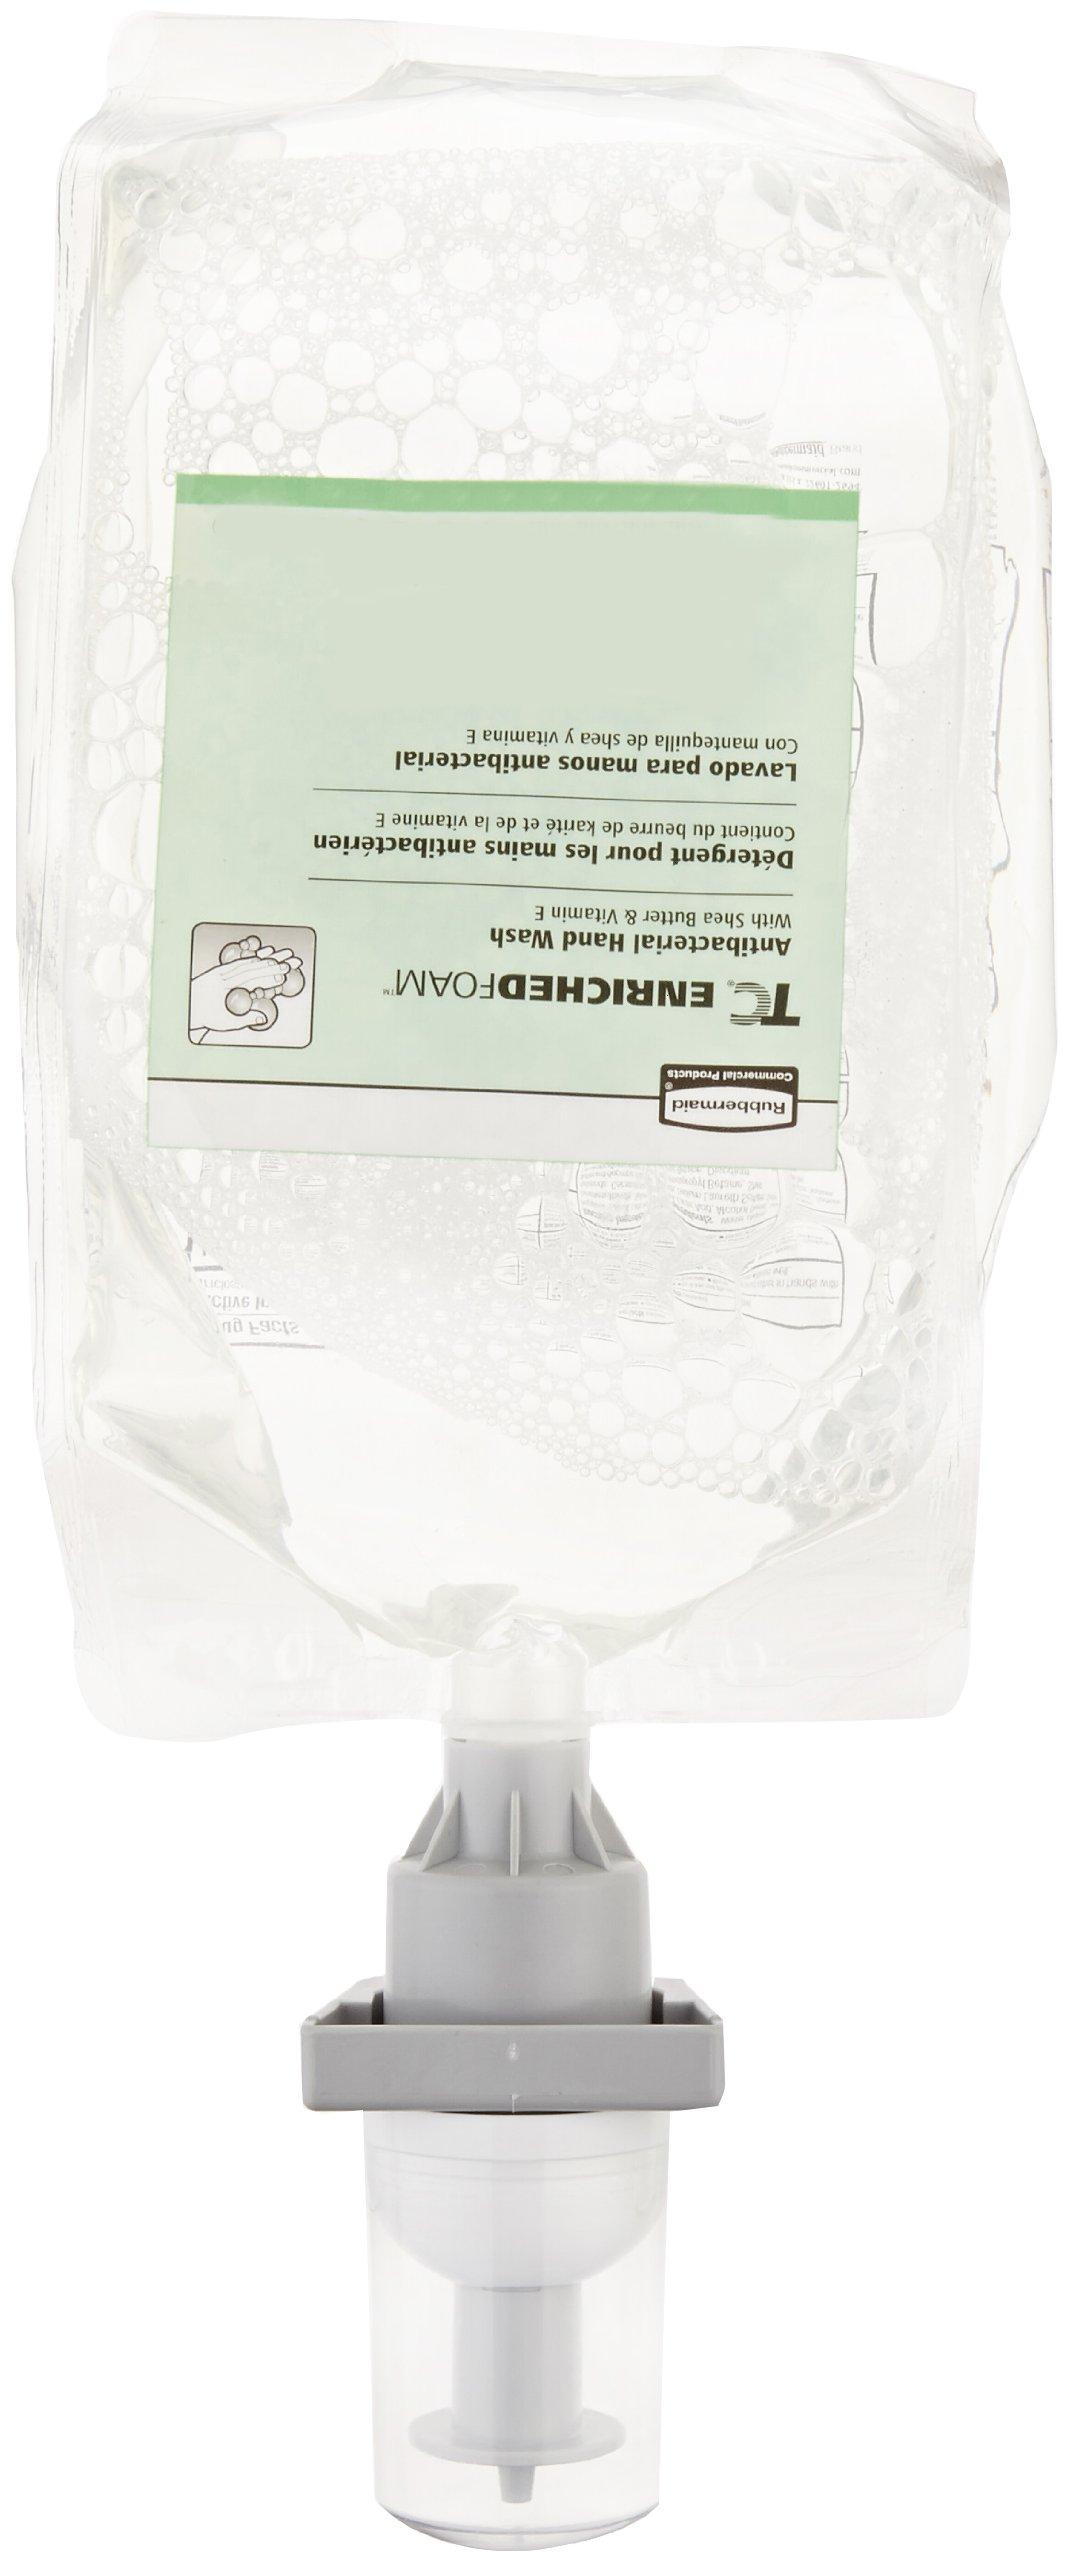 Rubbermaid 3486573 Enriched Foam Antibacterial Hand Wash E2, 1300mL Refill